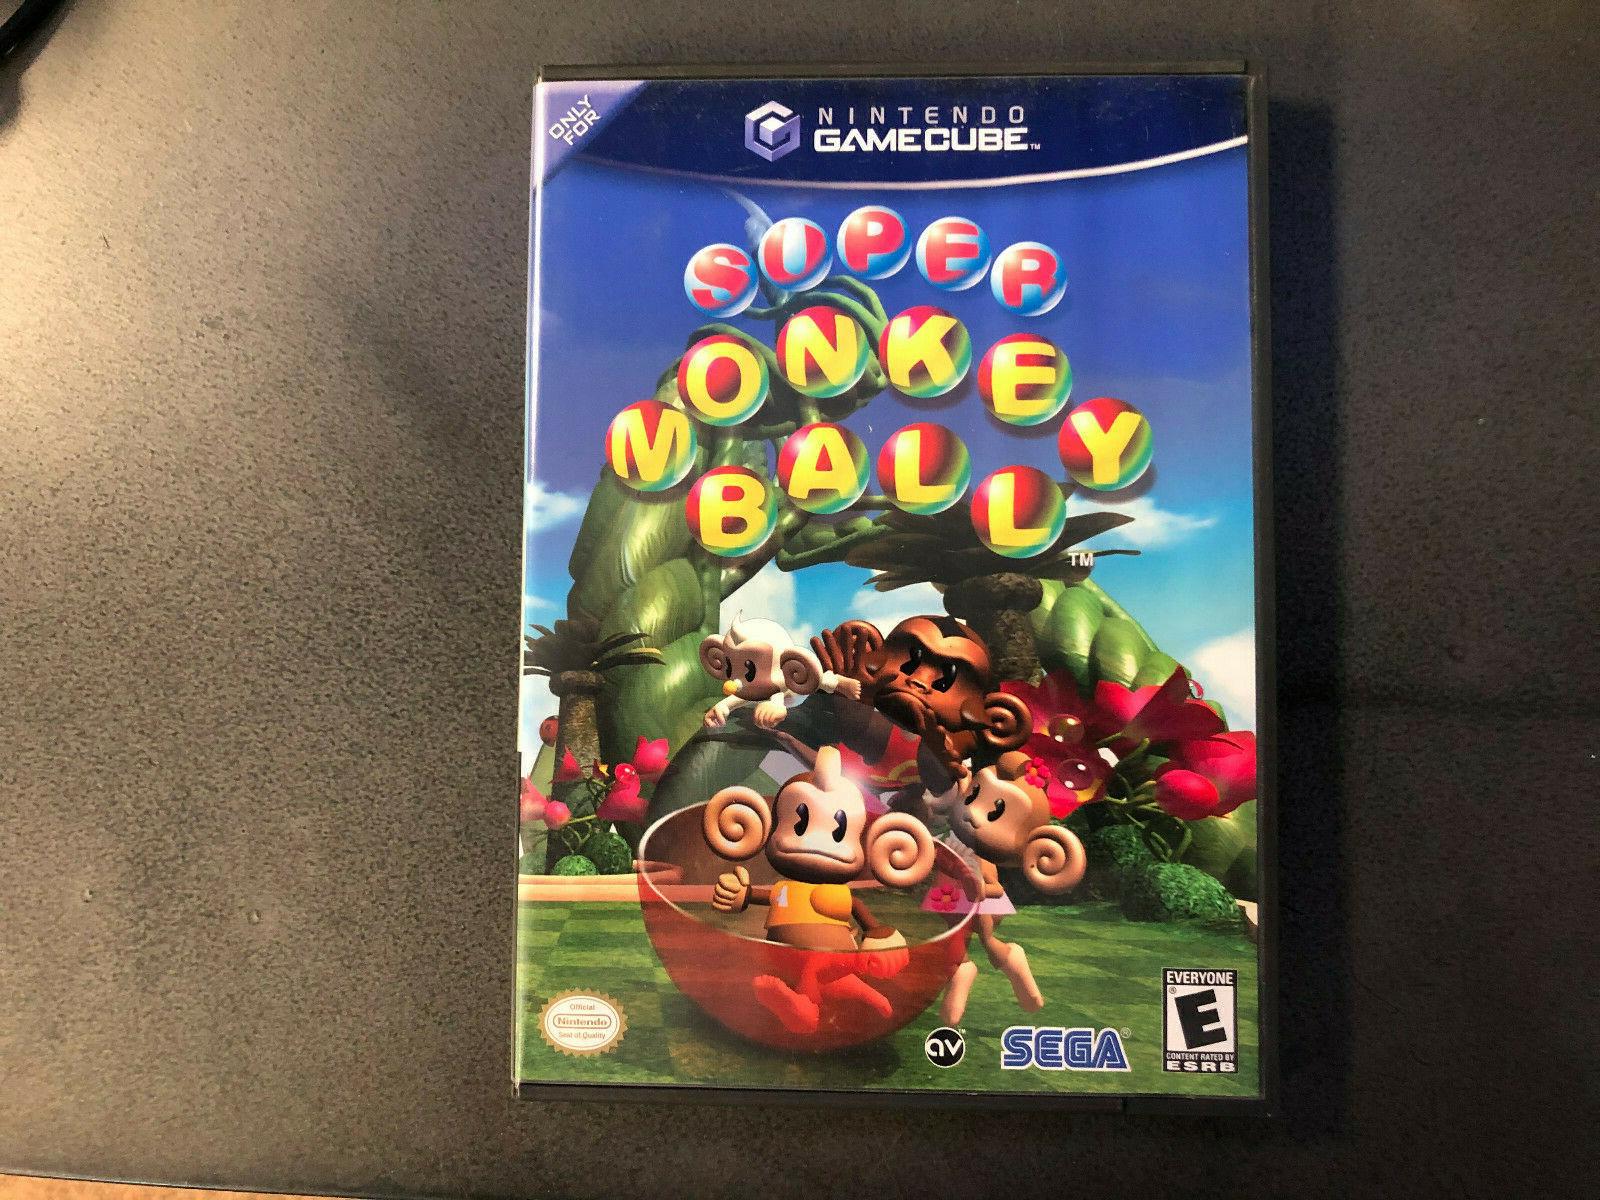 Super Monkey Ball Nintendo GameCube, 2001 Black Label CIB RARE Tested  - $44.00